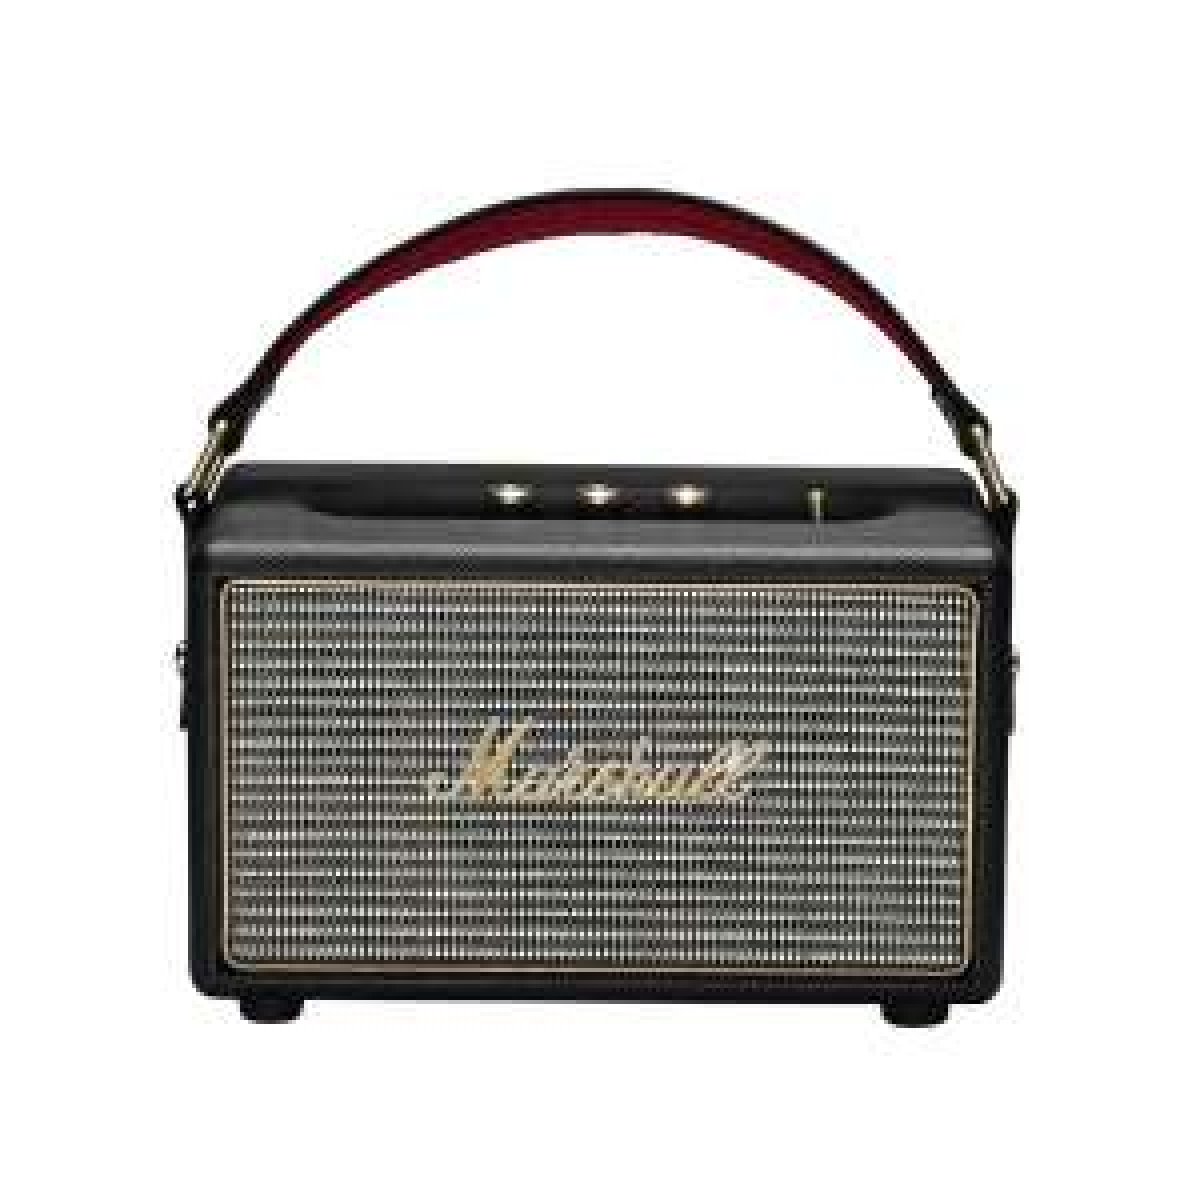 [NBB oder Amazon] Marshall Kilburn portabler Bluetooth Lautsprecher ( Akkulaufzeit 20 h, Line-In 3,5mm Klinke ,70 Watt Nennbelastung) - neuer Idealo Bestpreis